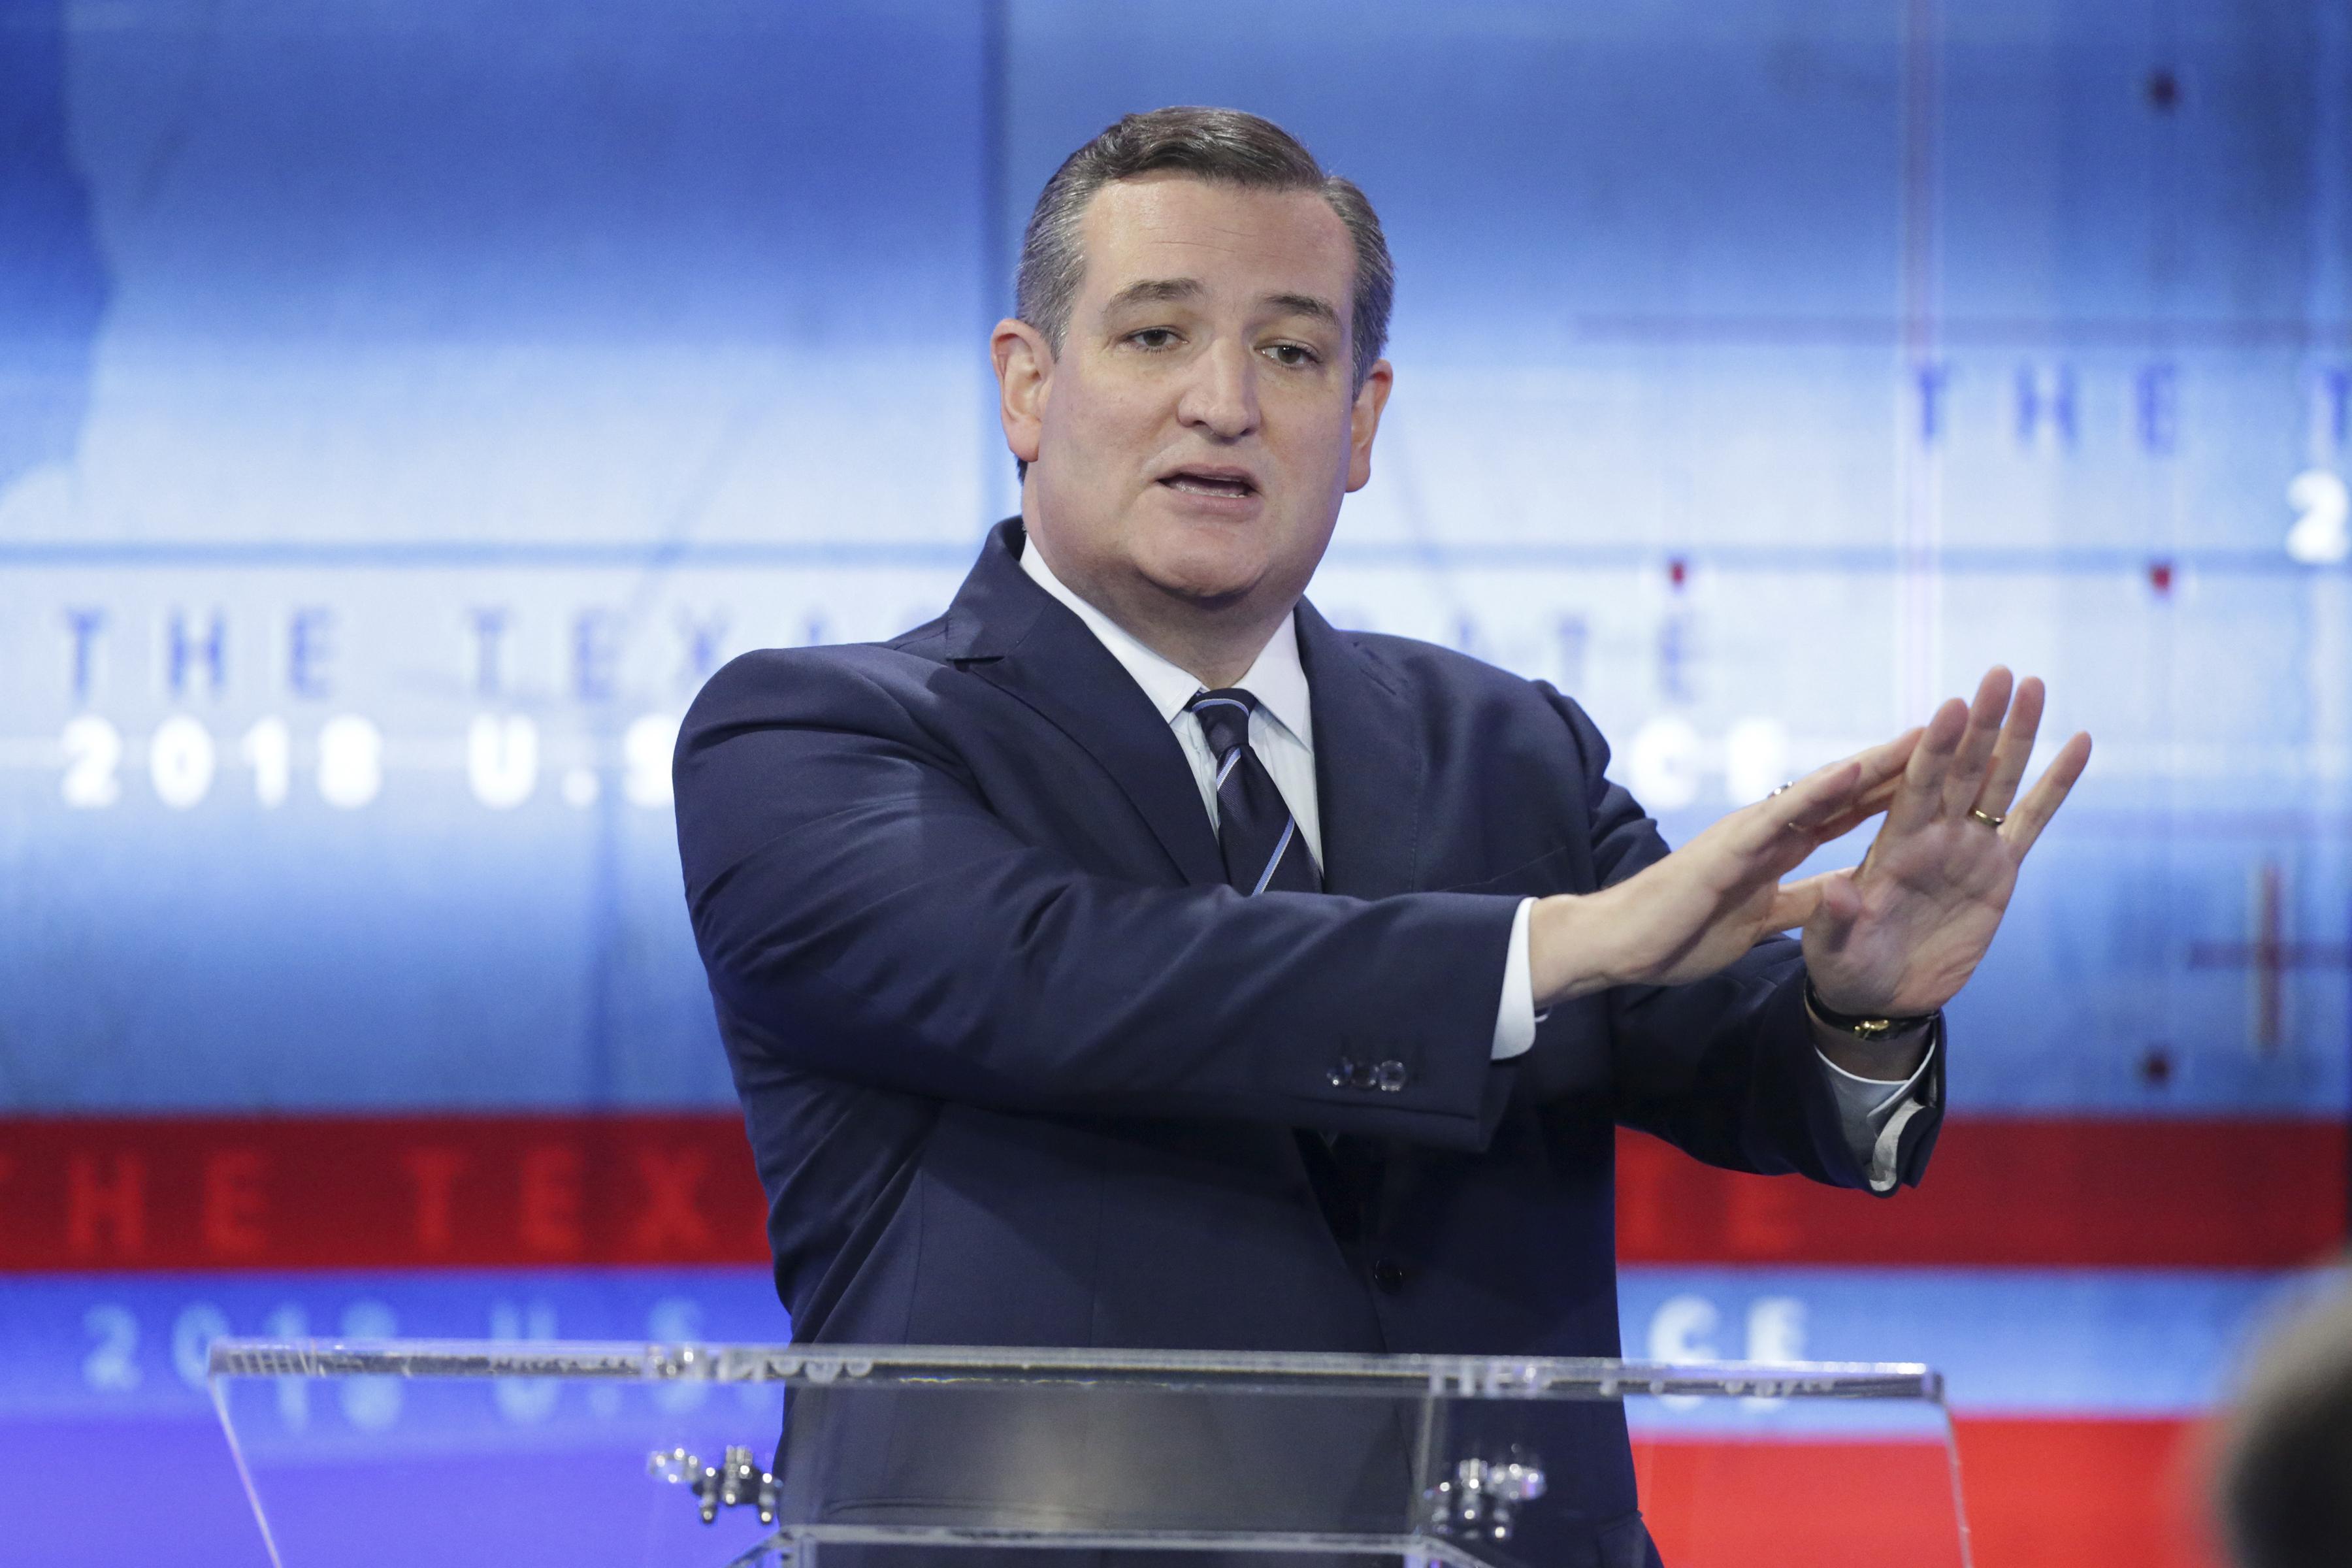 Sen. Ted Cruz And Beto O'Rourke Debate In San Antonio